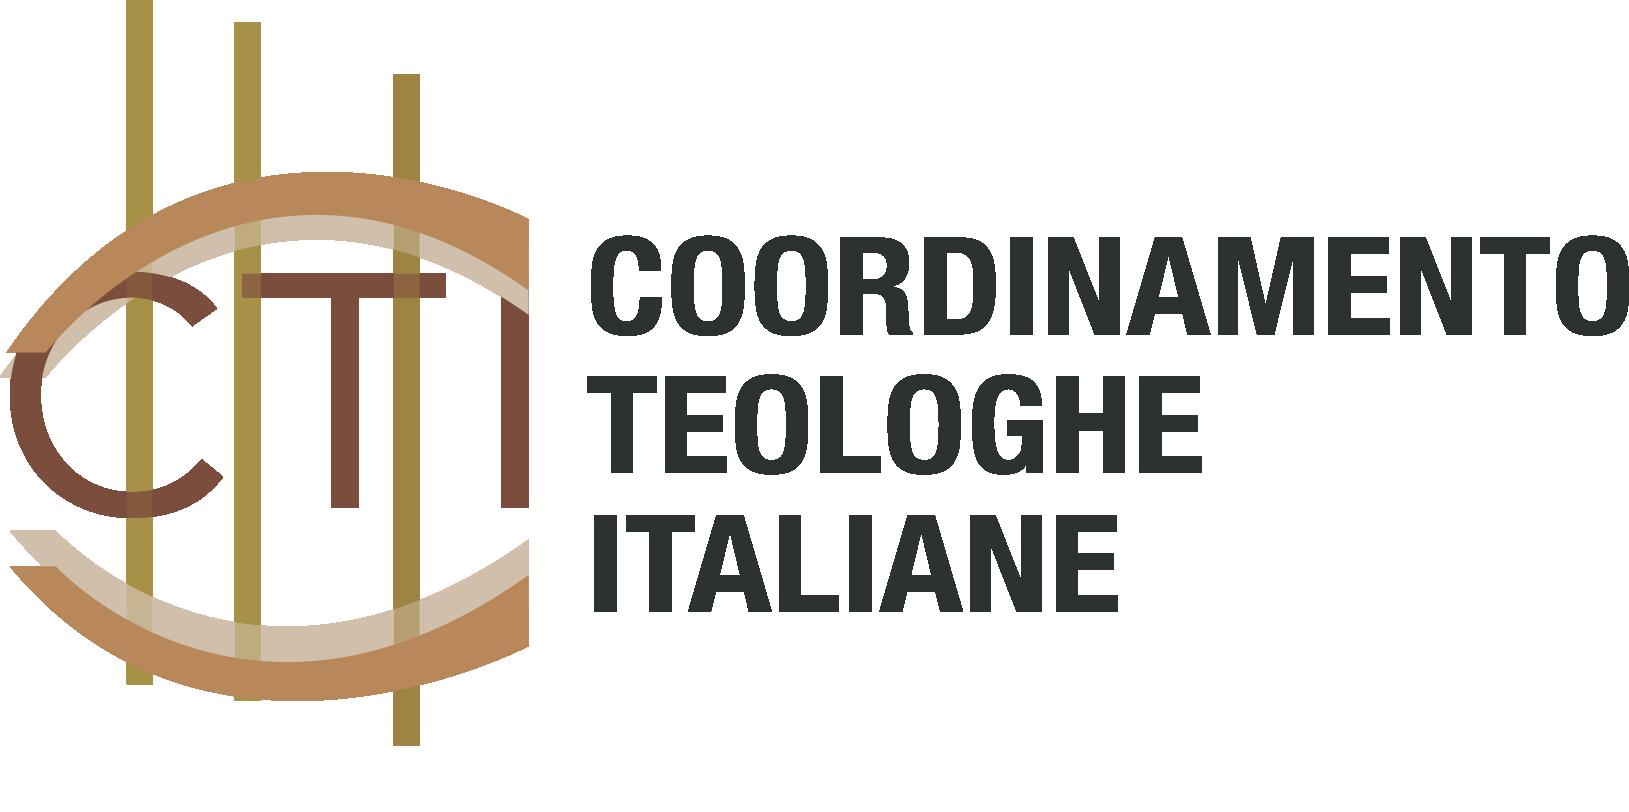 CTI – Coordinamento Teologhe Italiane